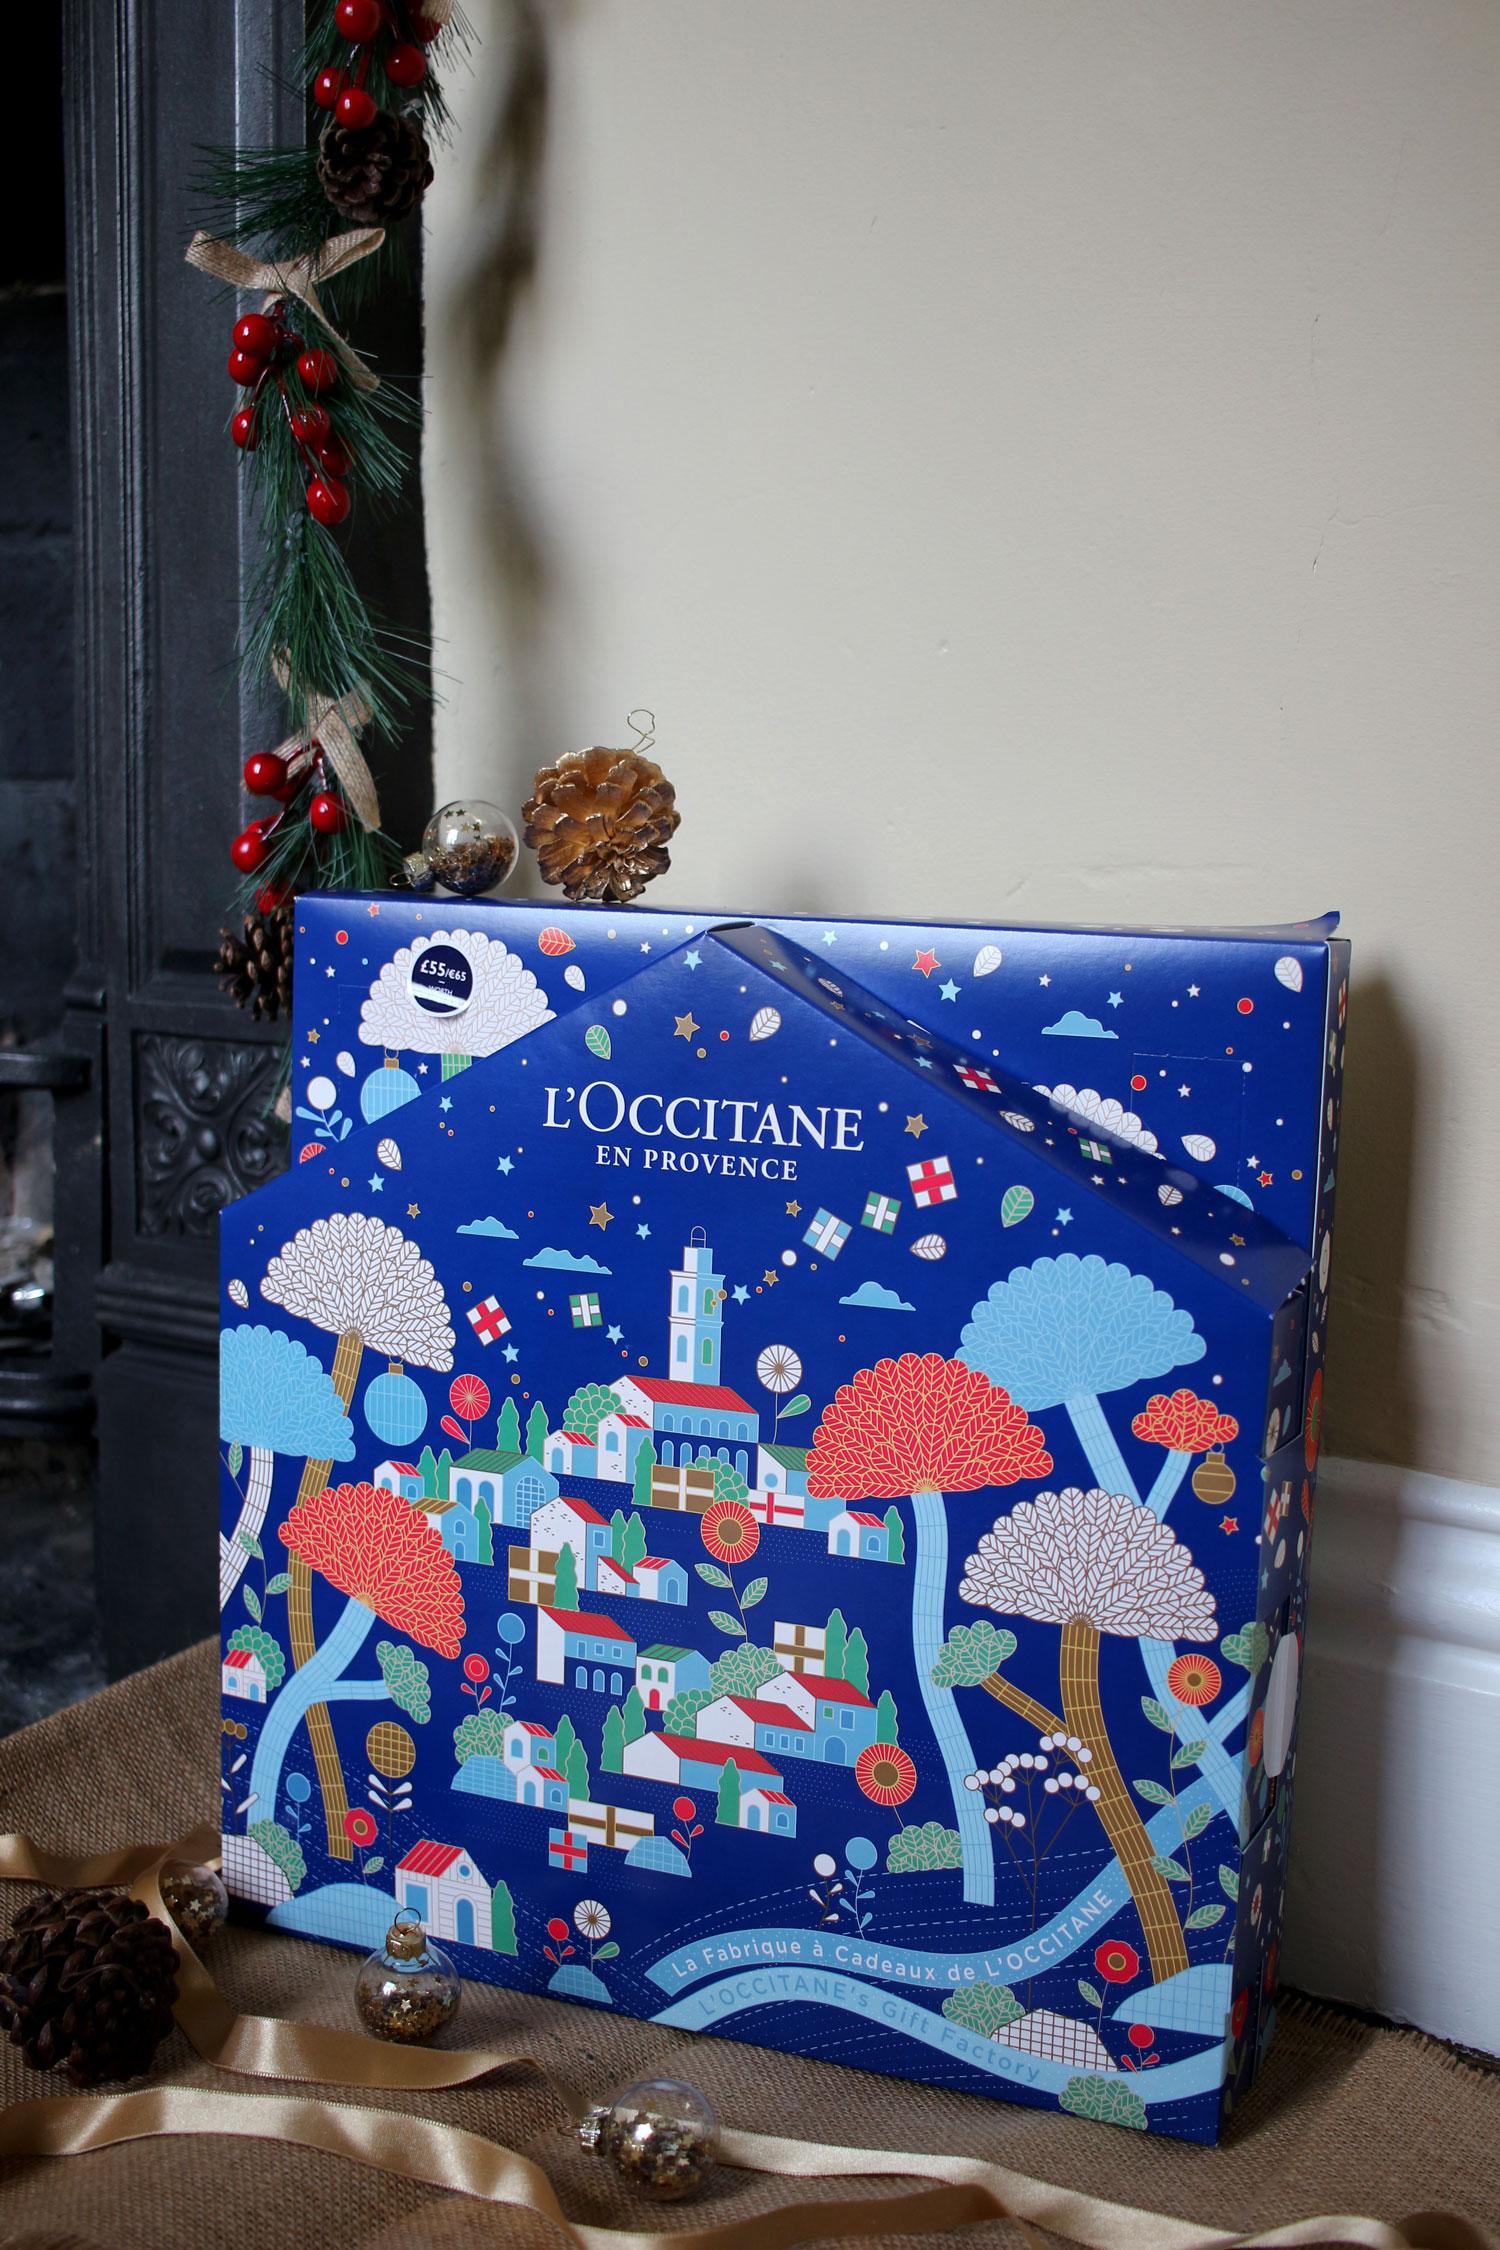 Loccitane-beauty-advent-calendar-2021-review